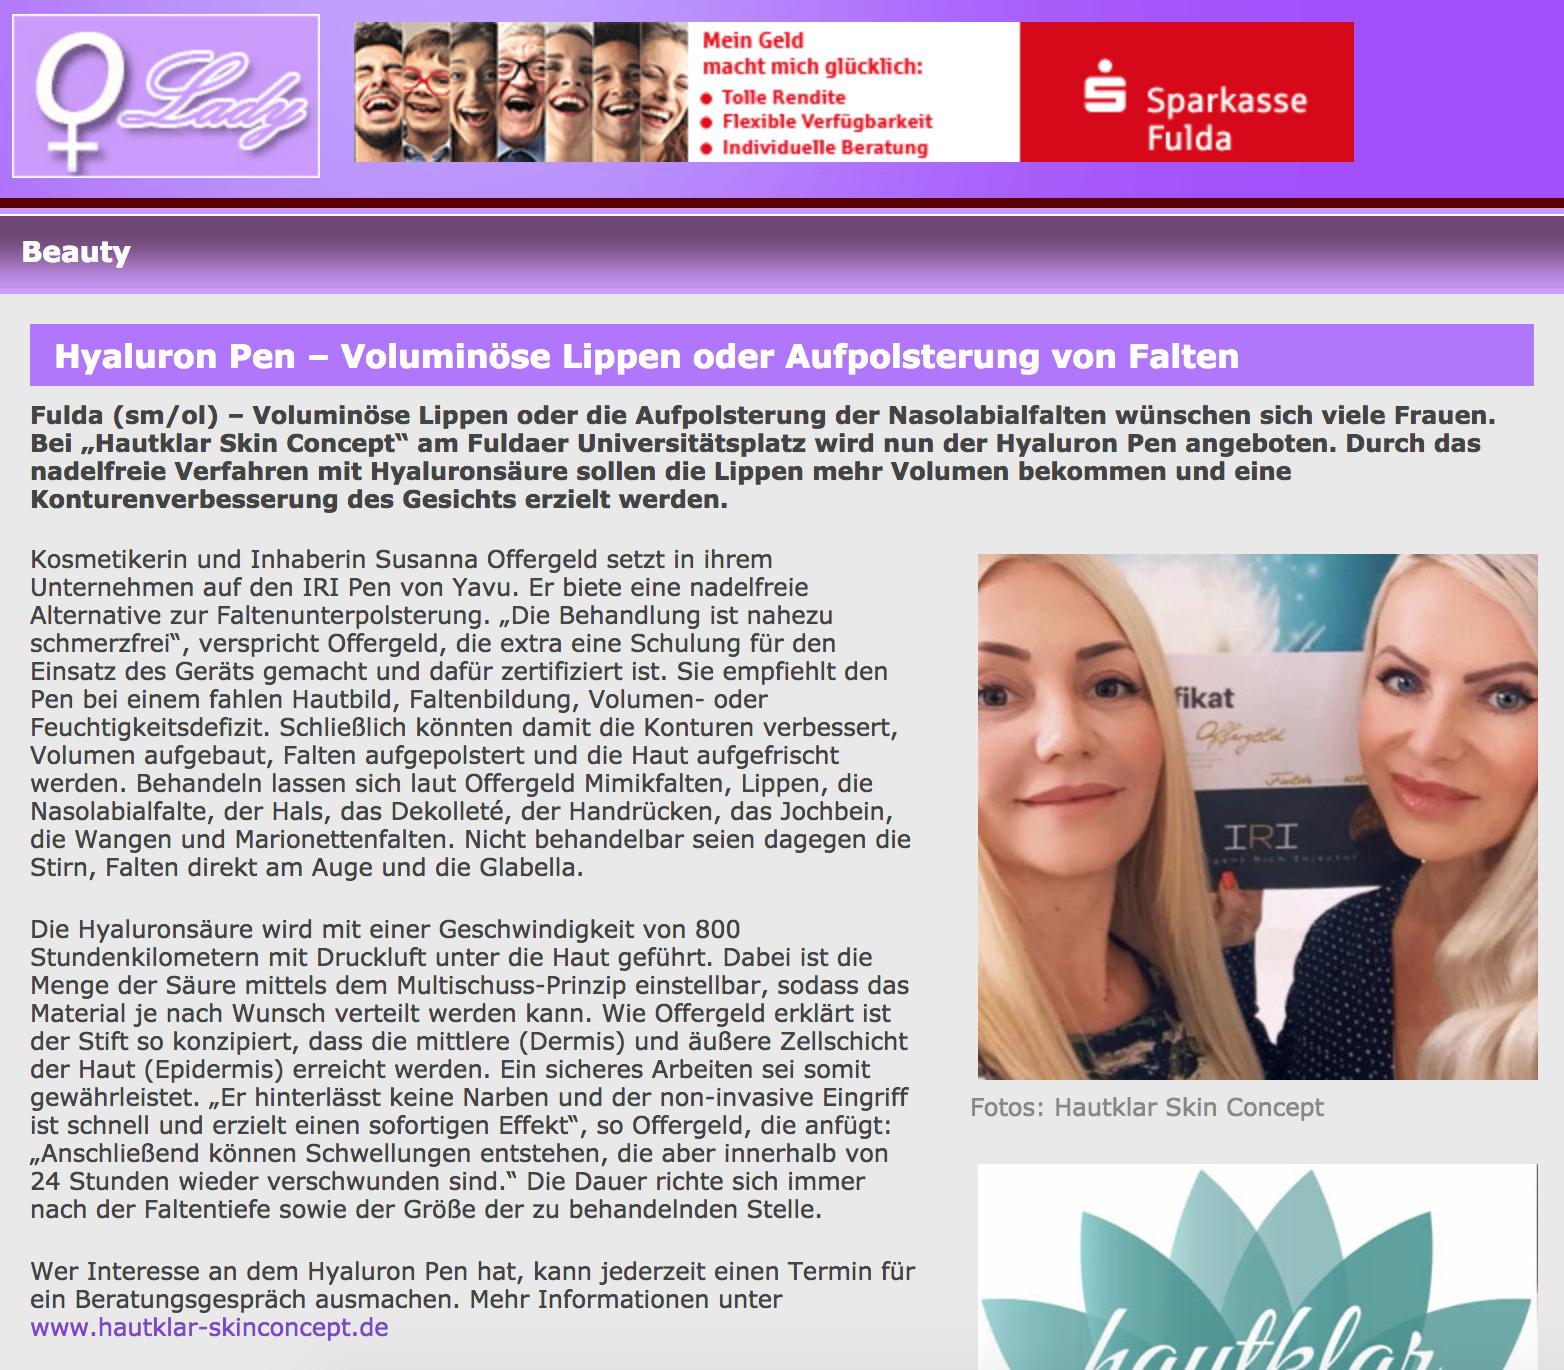 Bericht-presse-Hautklar-skin-Concept_Lippenvolumen